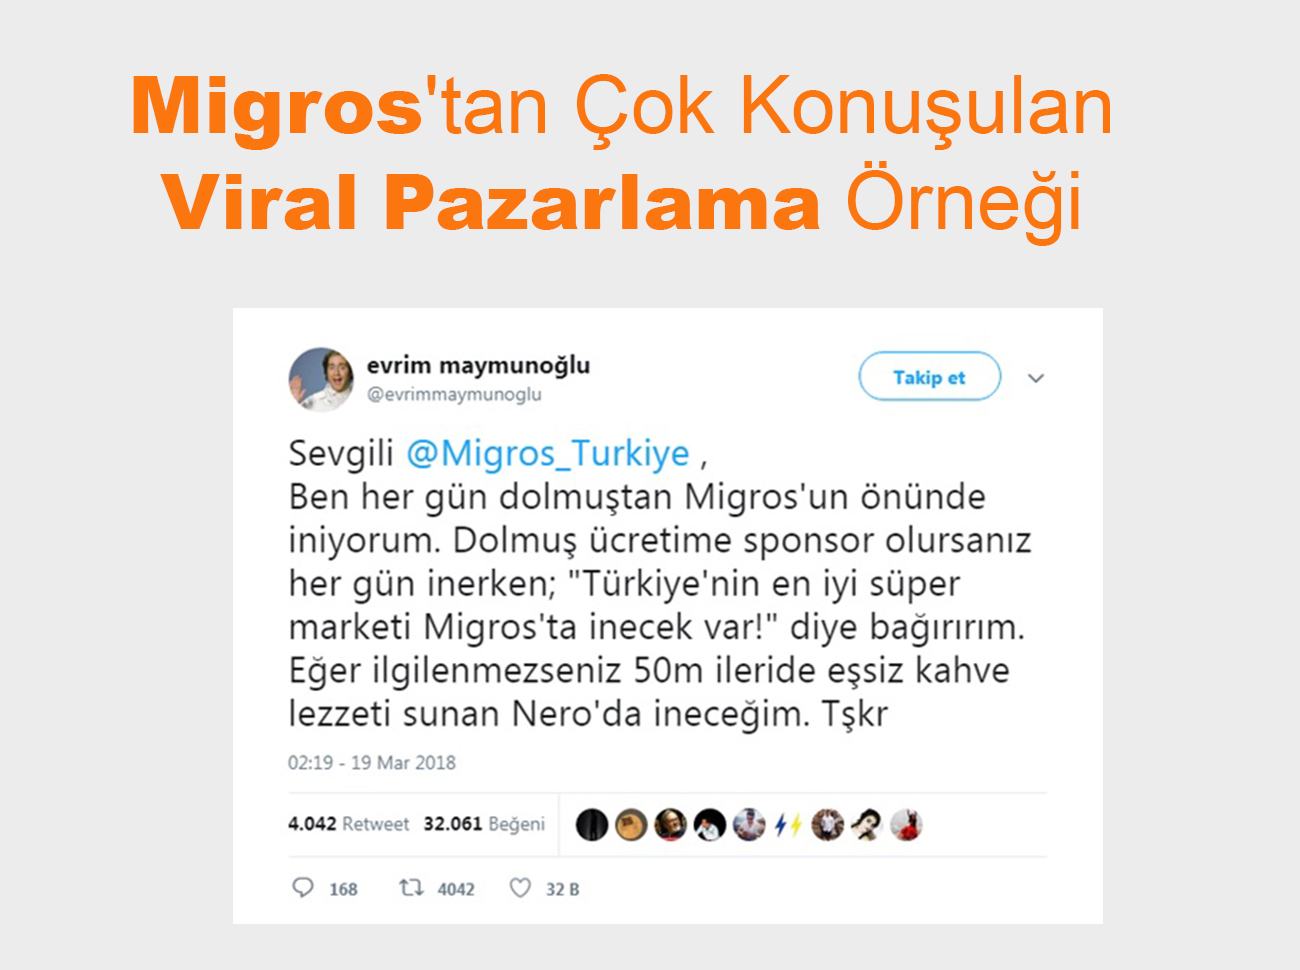 Migros'tan Çok Konuşulan Viral Pazarlama Örneği